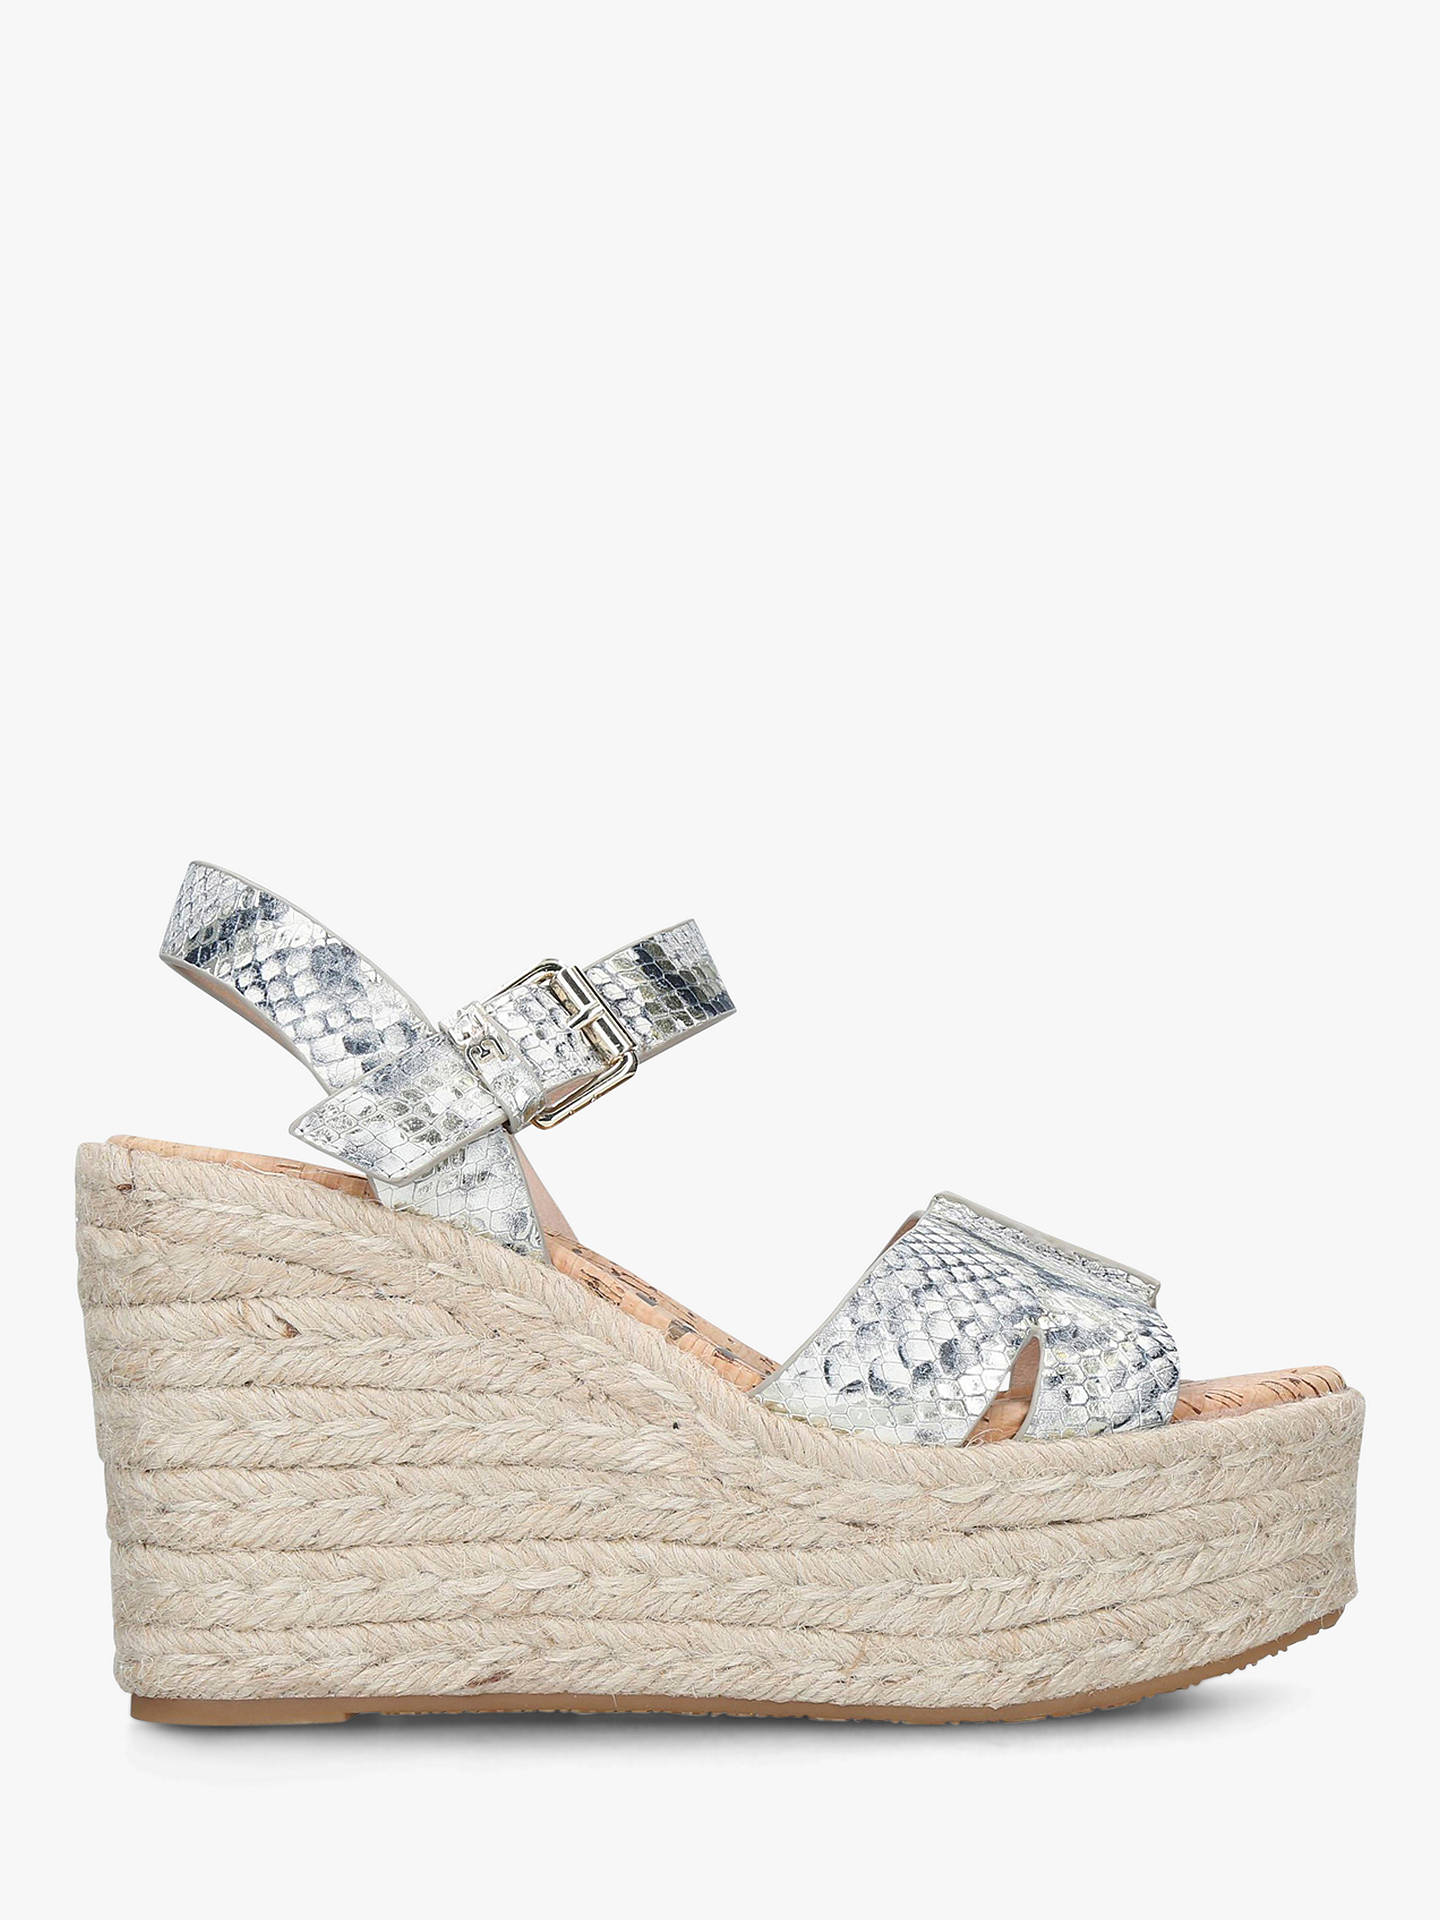 38c0d85e9578 Buy Sam Edelman Maura Leather Snake Print Wedge Sandals